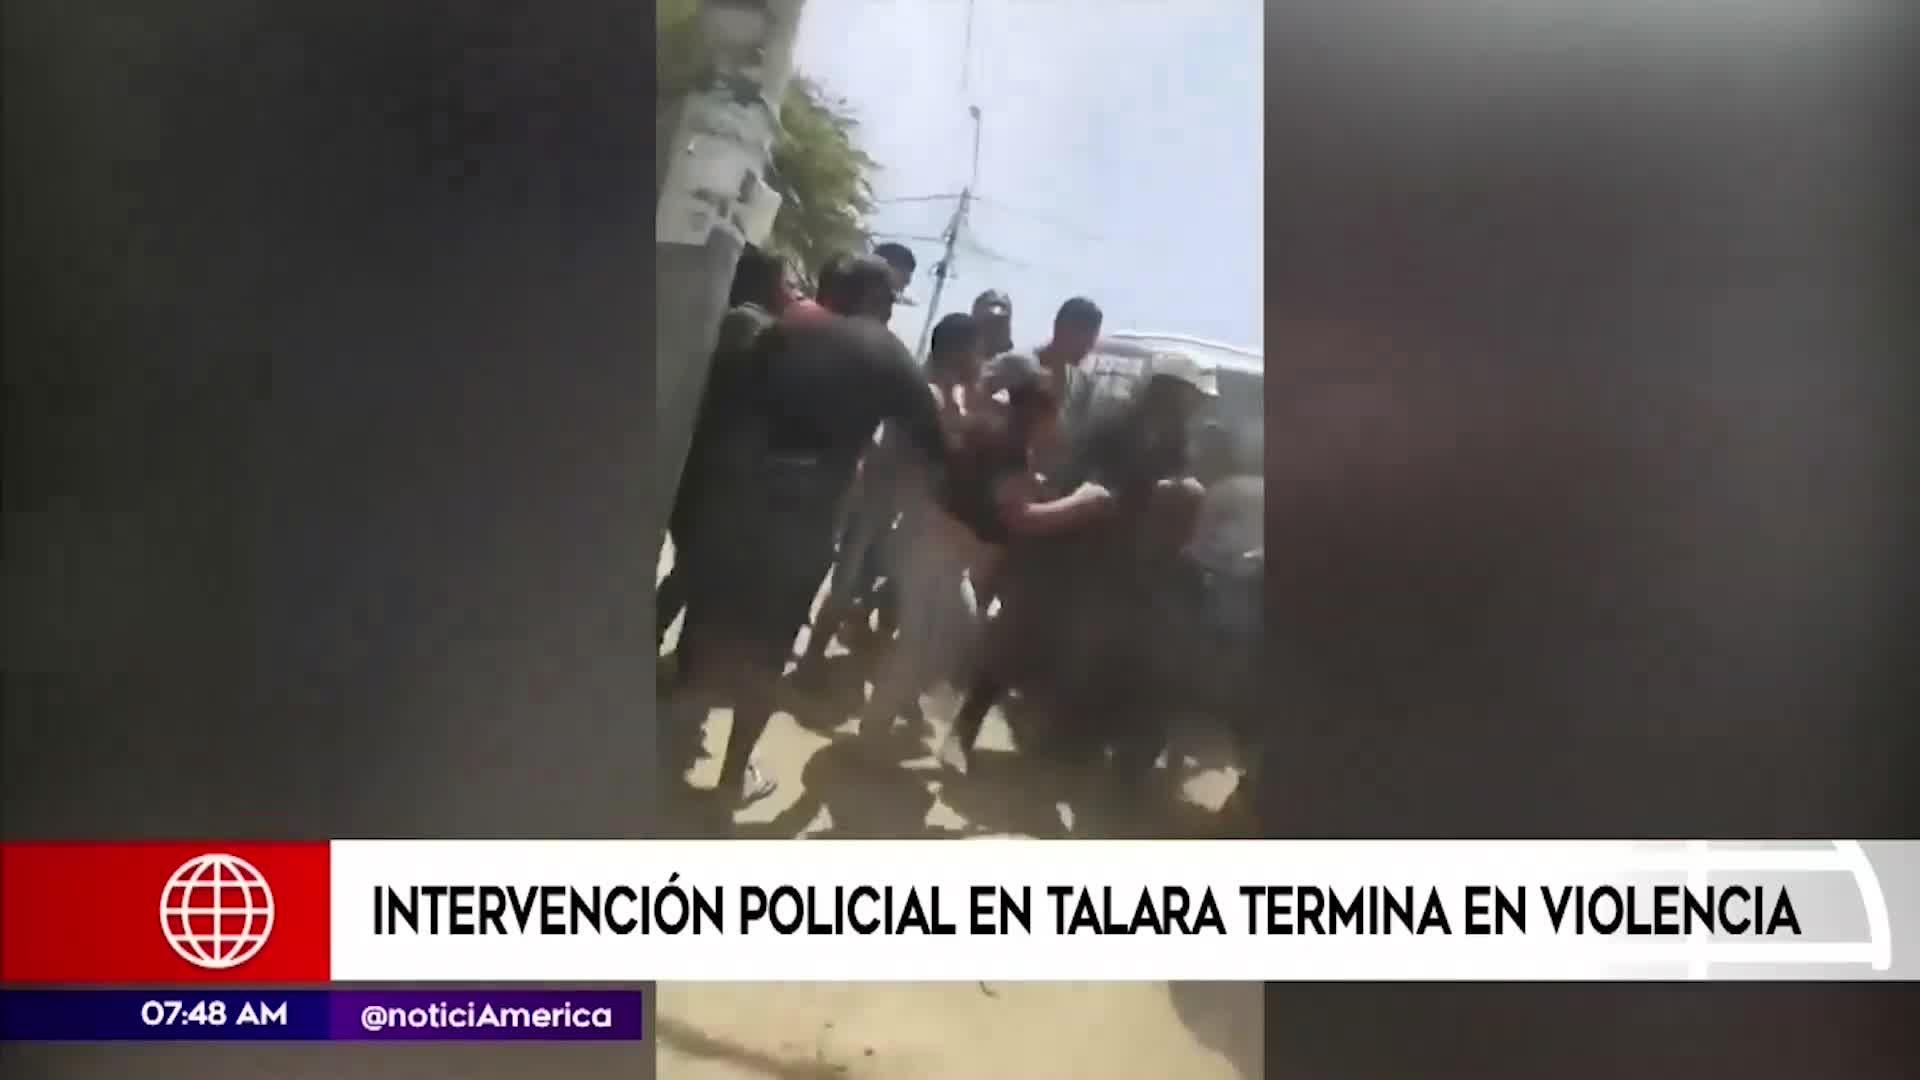 Talara: intervención policial termina en violencia